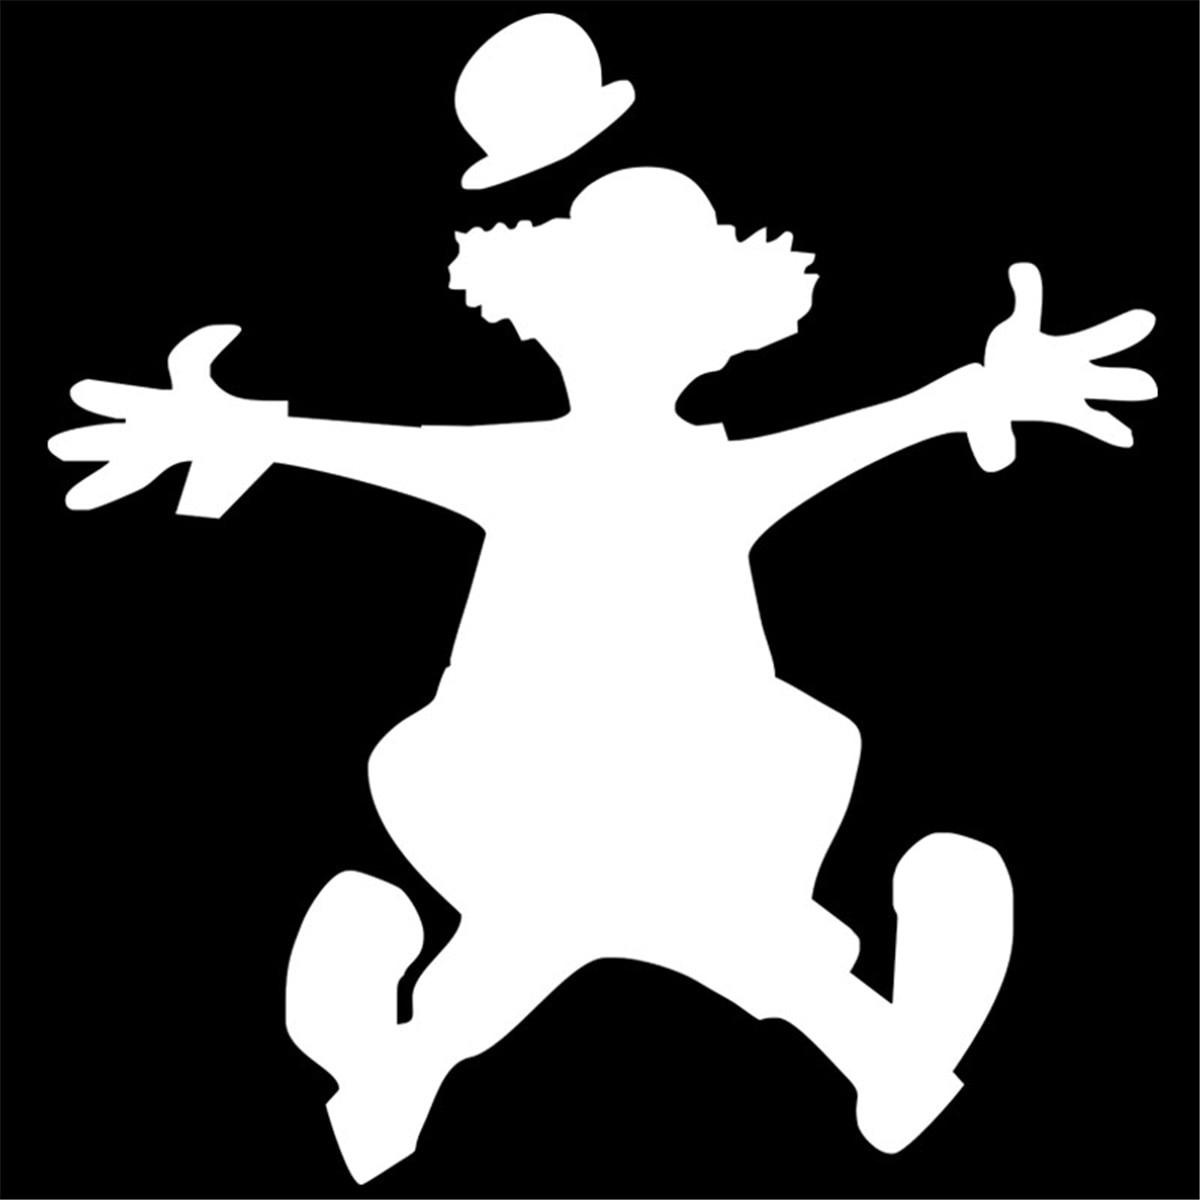 Jumping Clown Funny Sticker Car Window Door Laptop Vinyl Decal  Wall Home Decor